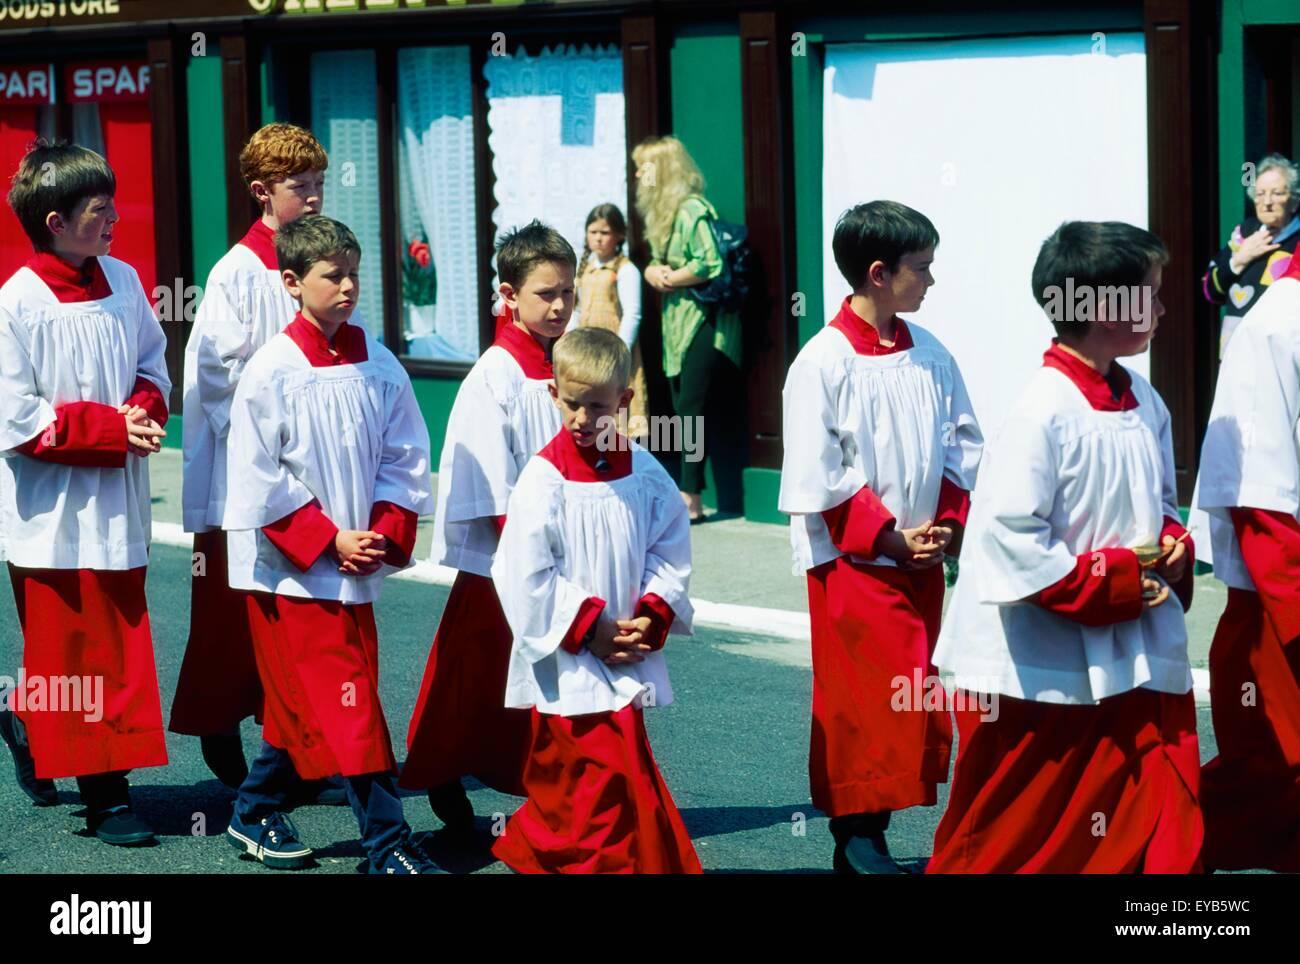 Ballydehob, Co Cork, Ireland; Corpus Christi Procession - Stock Image